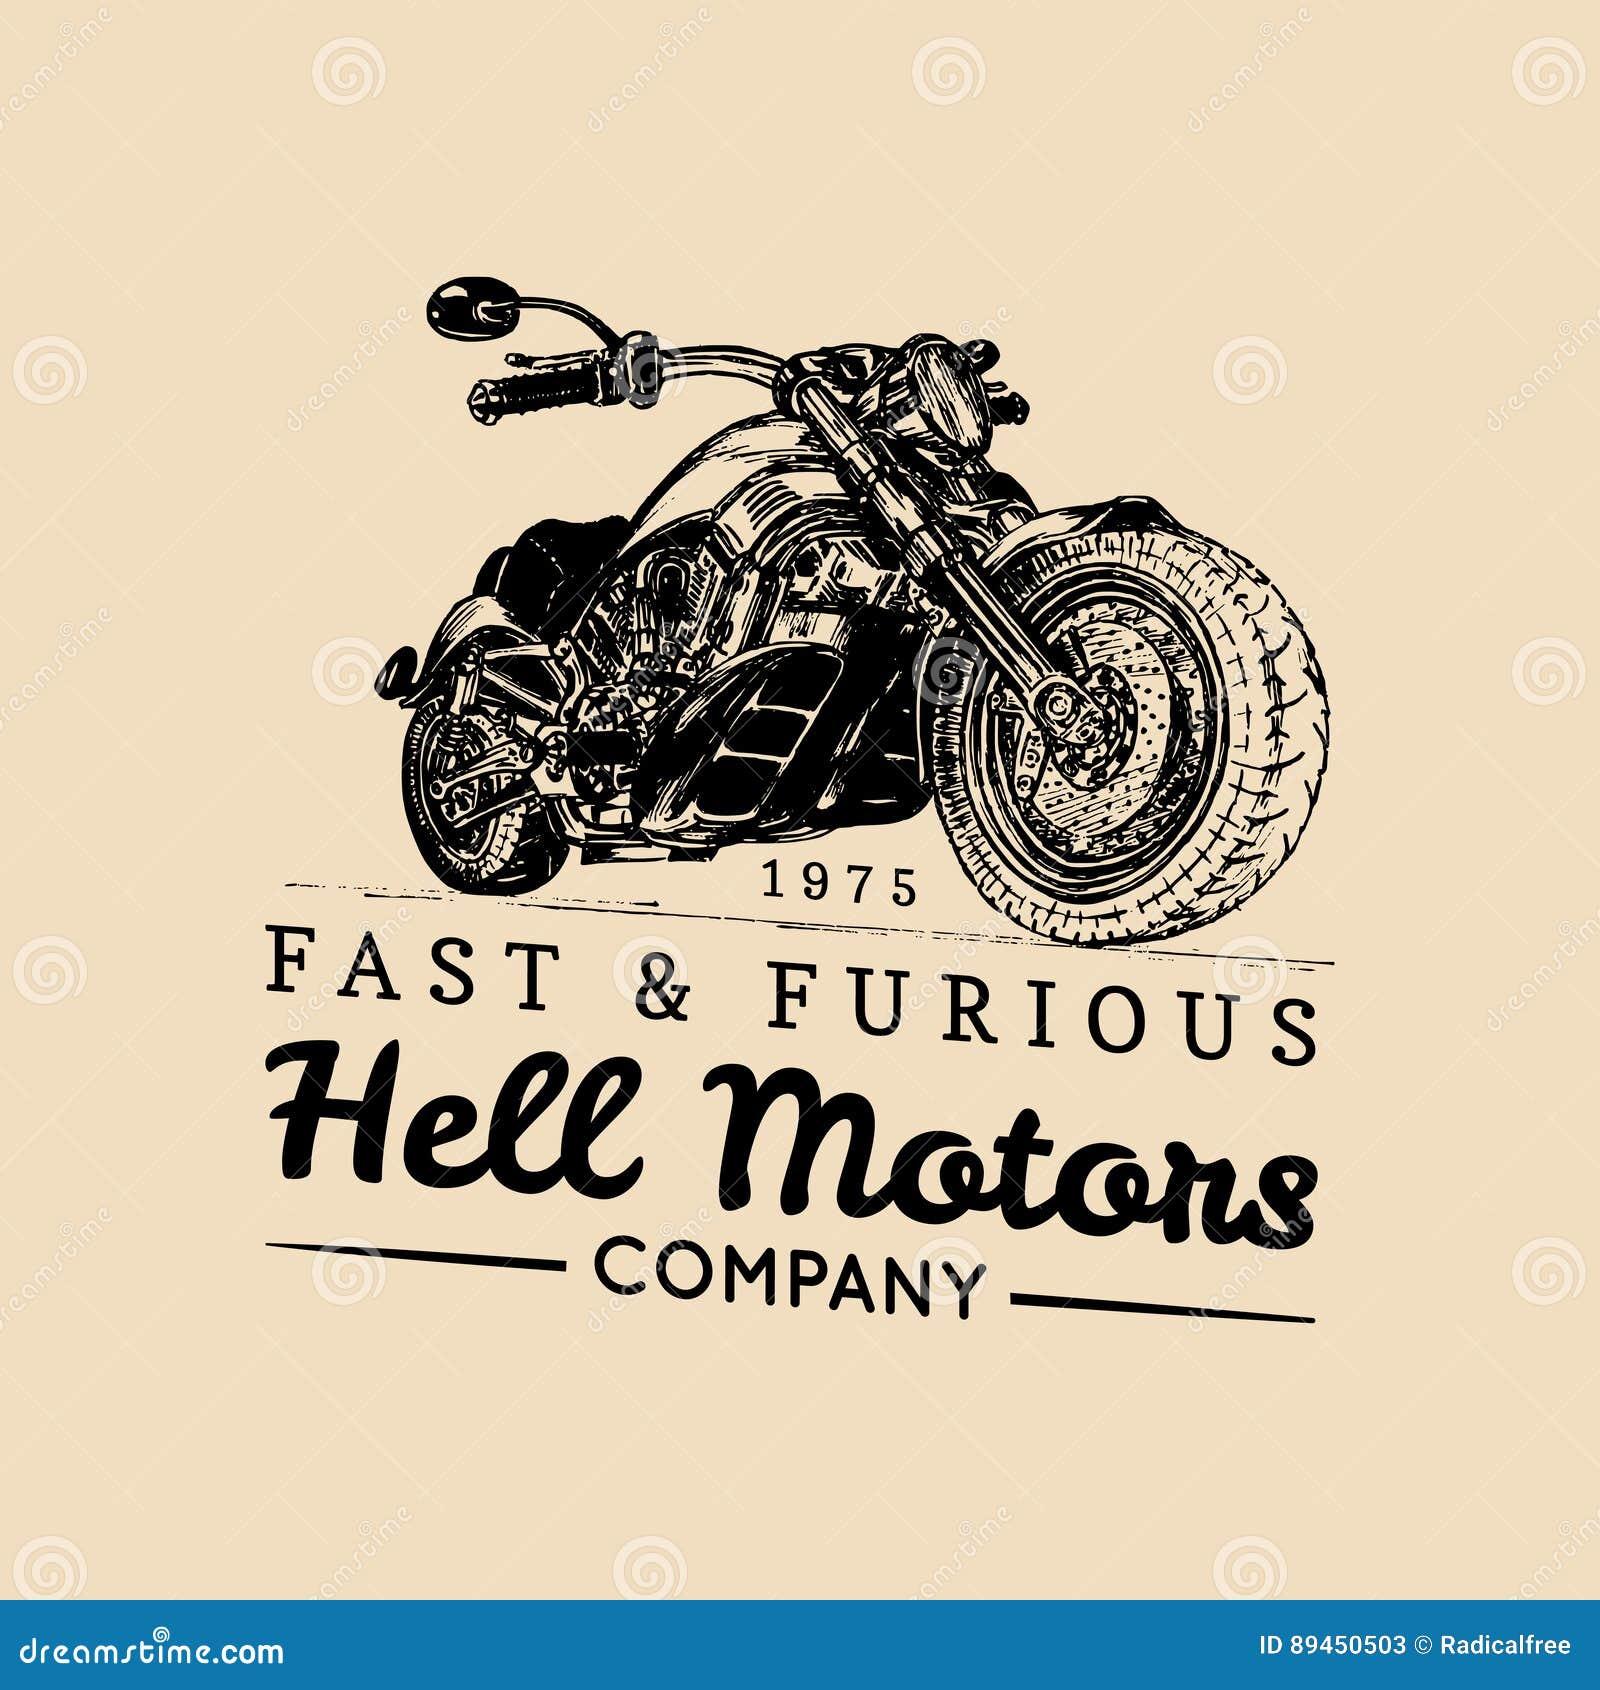 Vector vintage motorcycle logo.Biker store icon,MC sign, custom garage poster.Illustration of hand drawn classic chopper